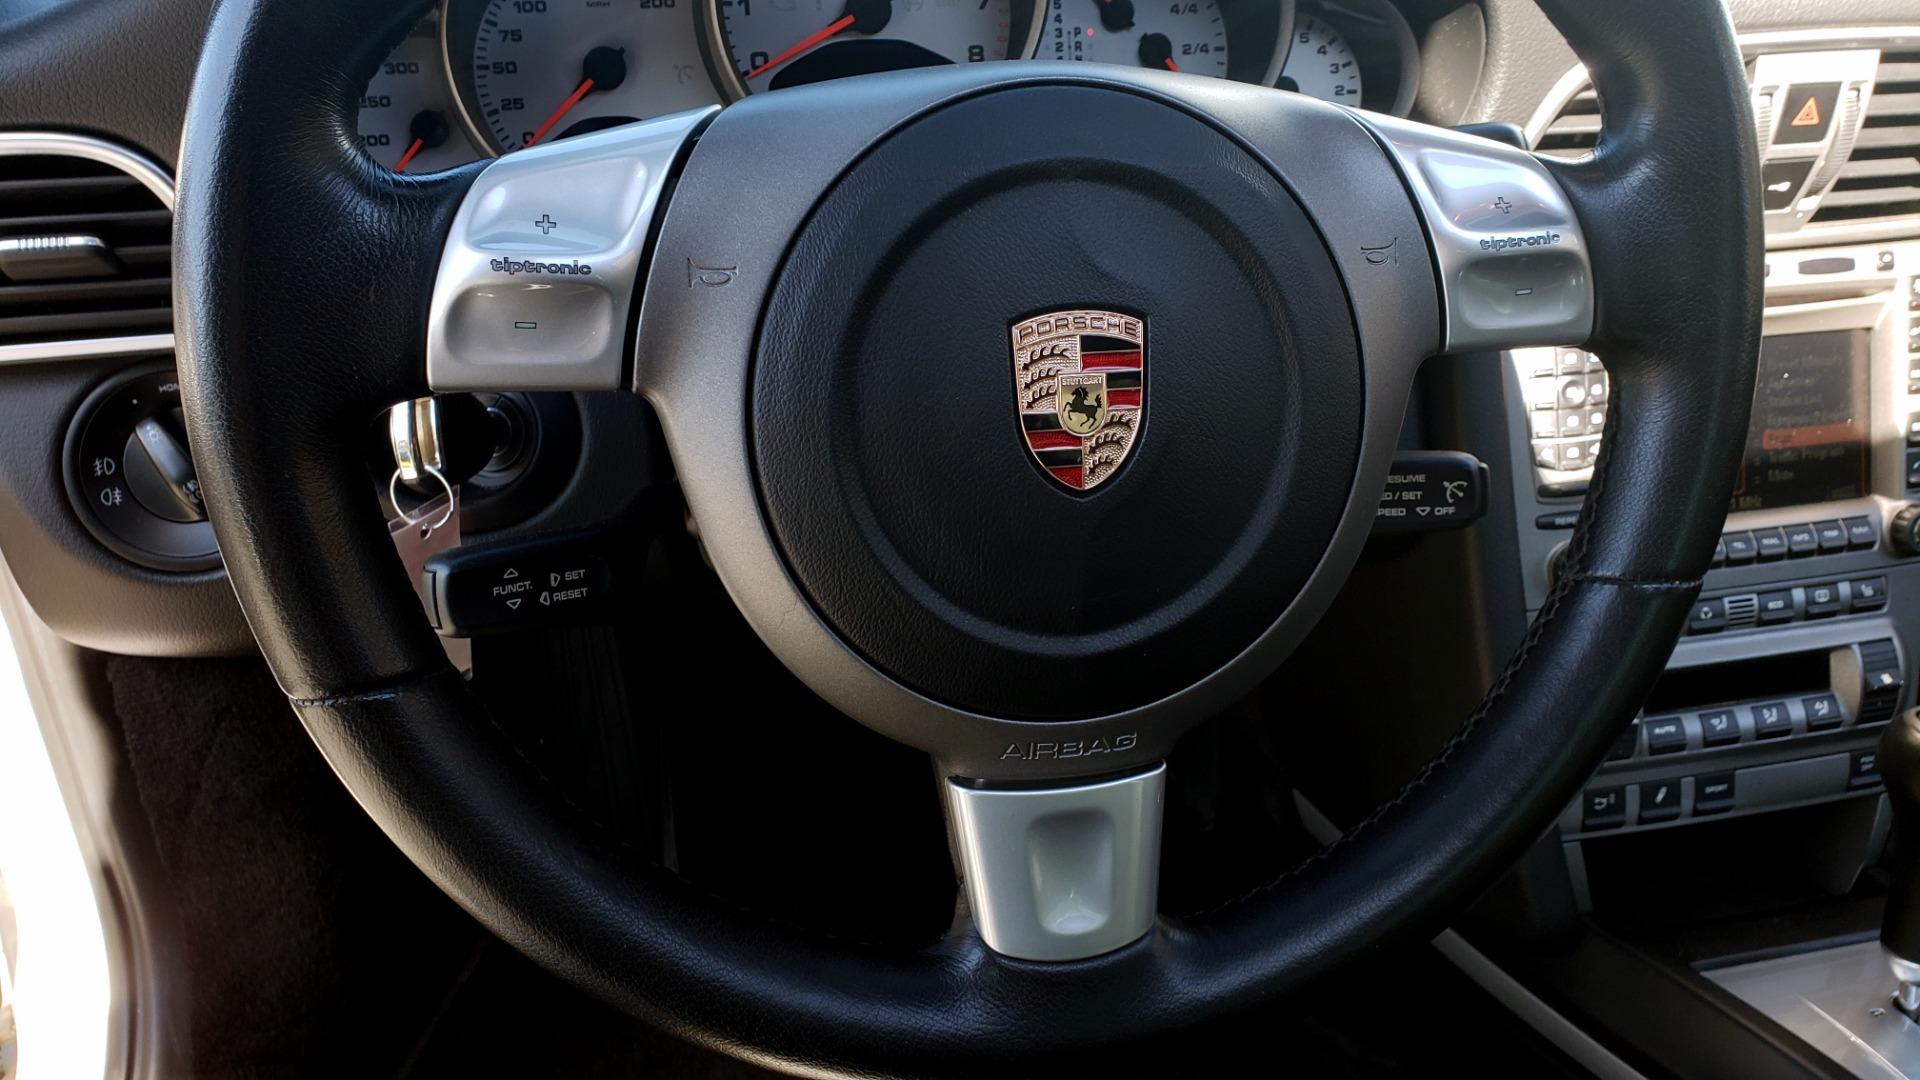 Used 2006 Porsche 911 CARRERA S / 5-SPD AUTO / SPORT CHRONO / NAV / BOSE / SUNROOF for sale Sold at Formula Imports in Charlotte NC 28227 34